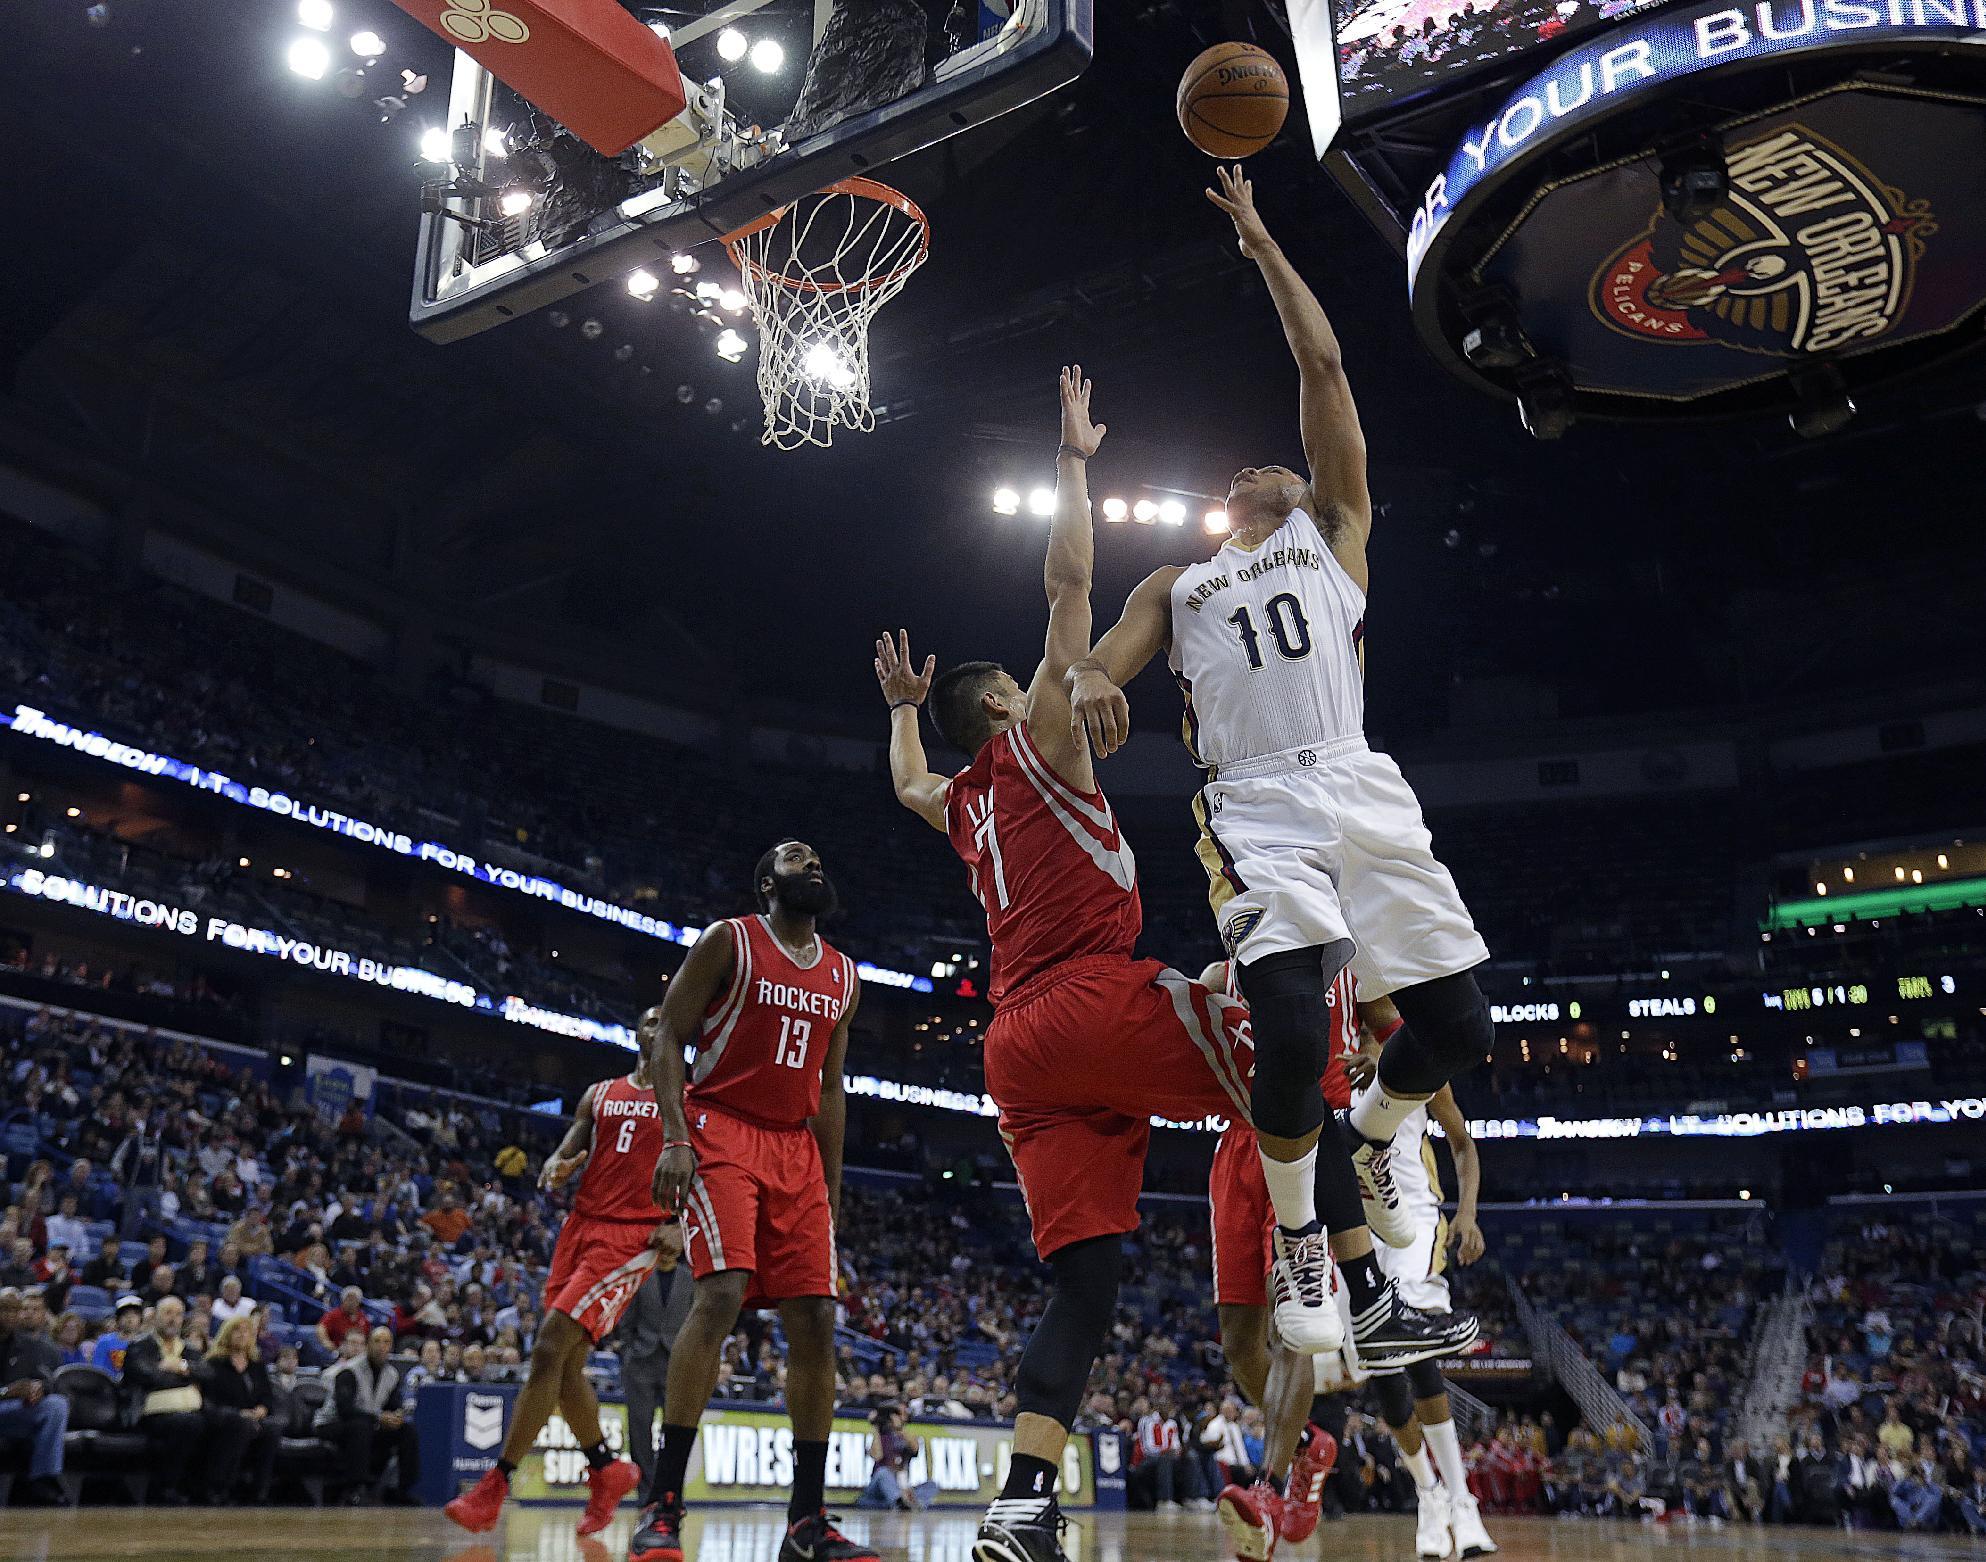 Harden lifts Rockets over Pelicans, 103-100